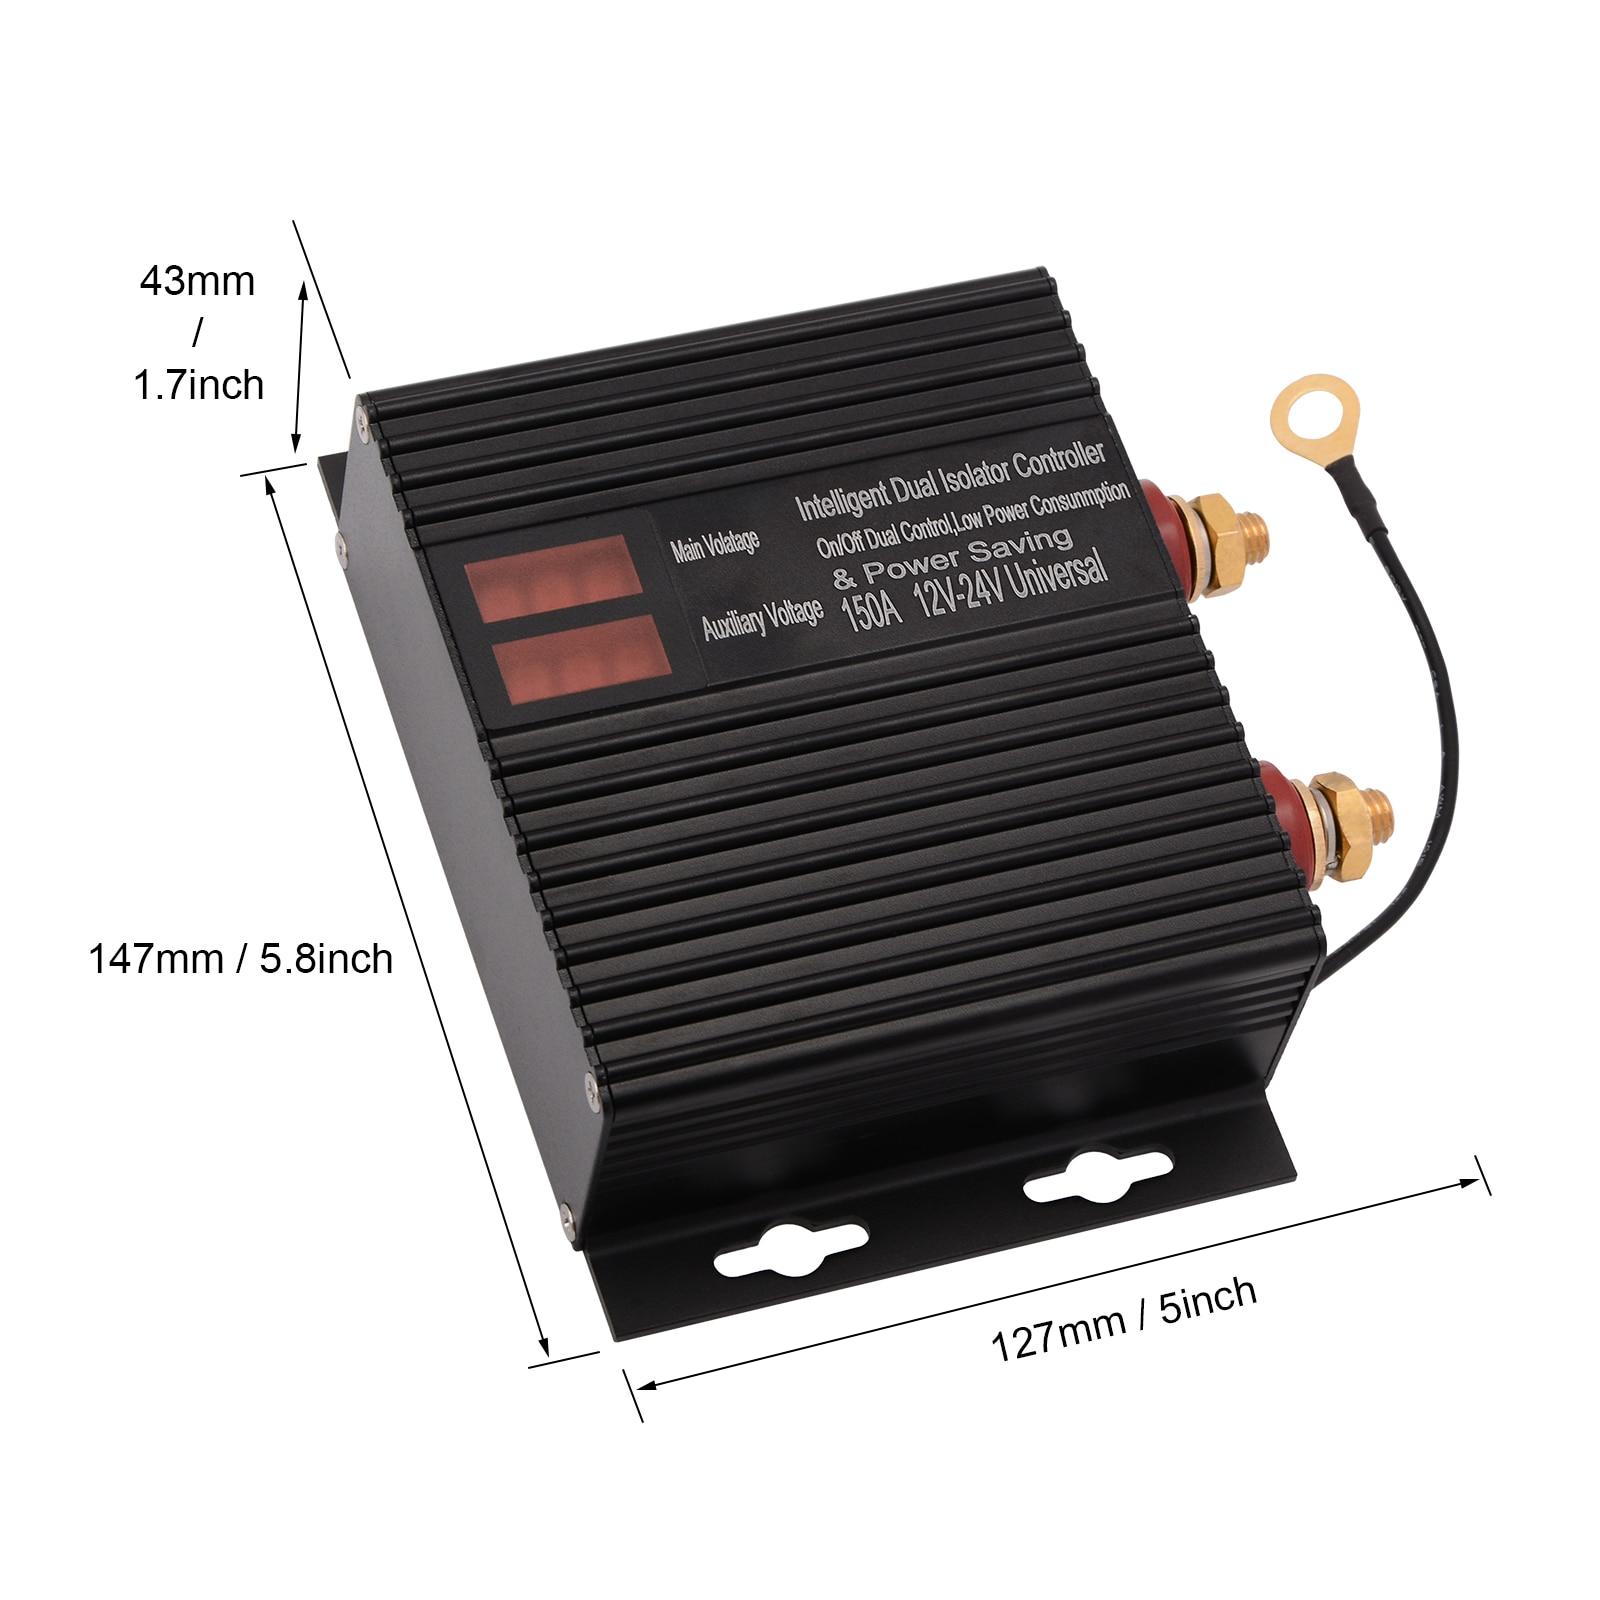 Купить с кэшбэком EHDIS 12V 24V 150A Car Dual Battery Switch Relay Auto Disconnection Isolator Power Controller Protection Vehicle Motor Accessory